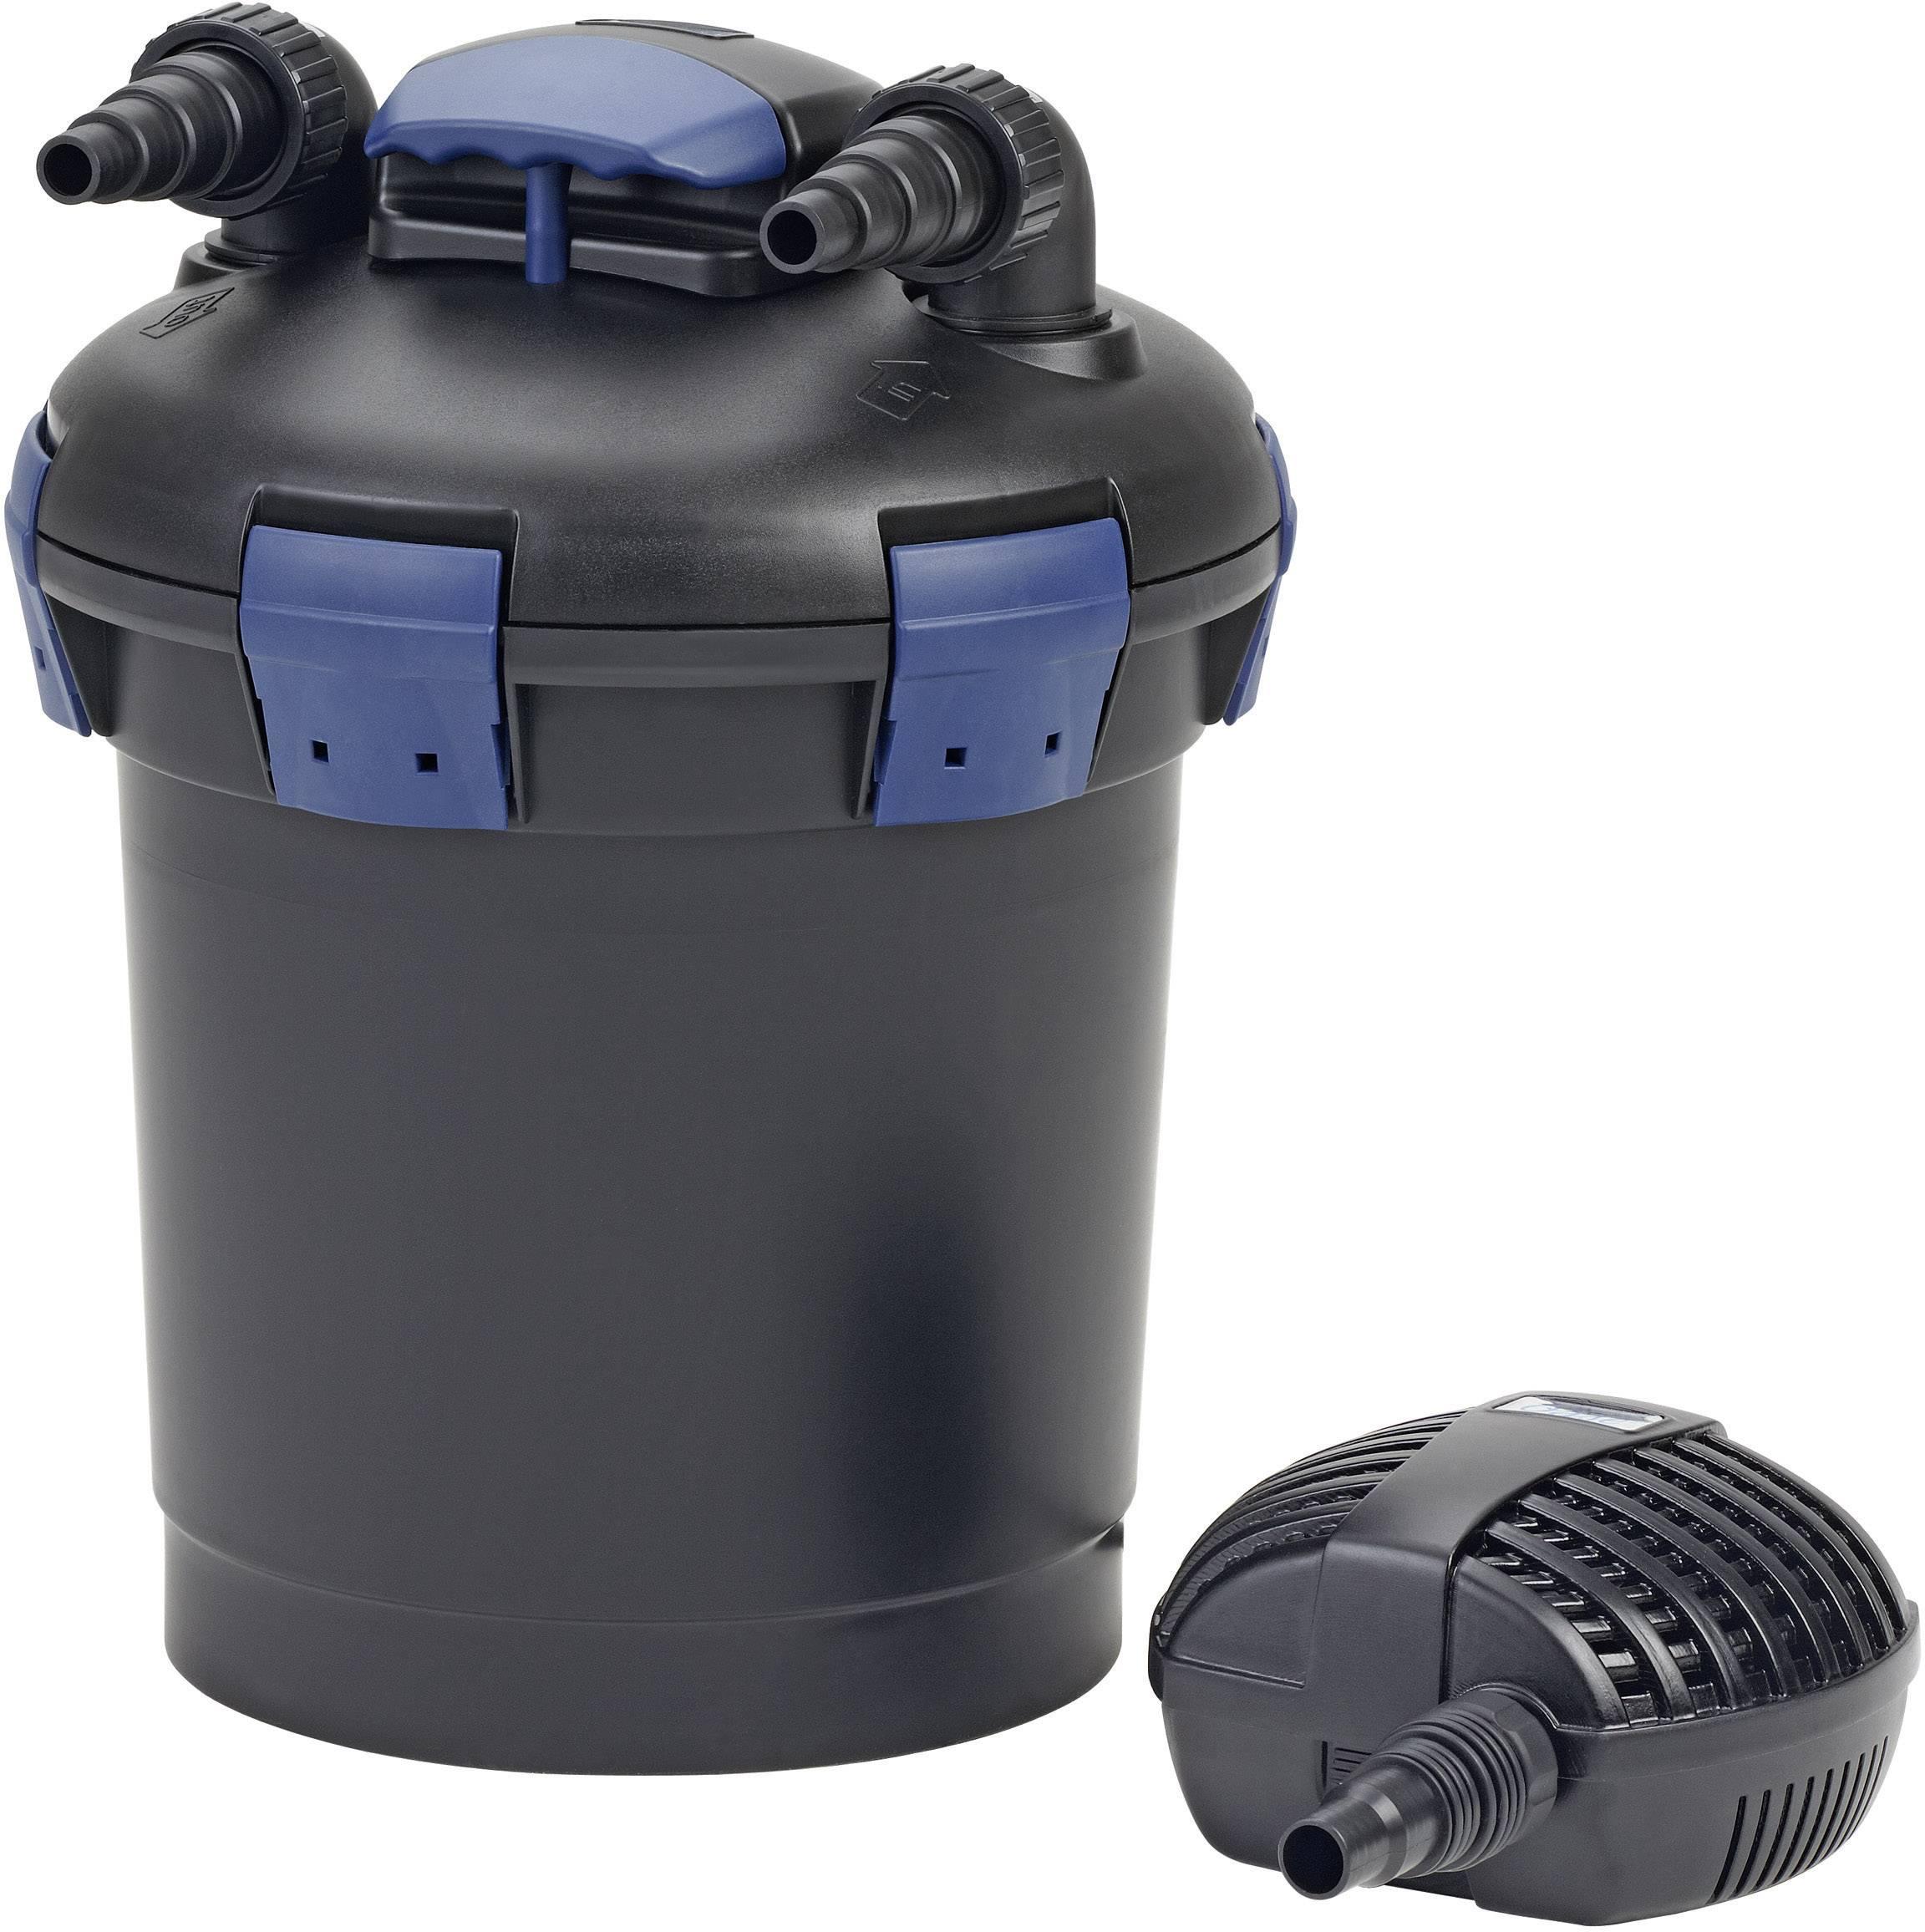 Tlakový filter pre jazierka Oase Biopress 6000